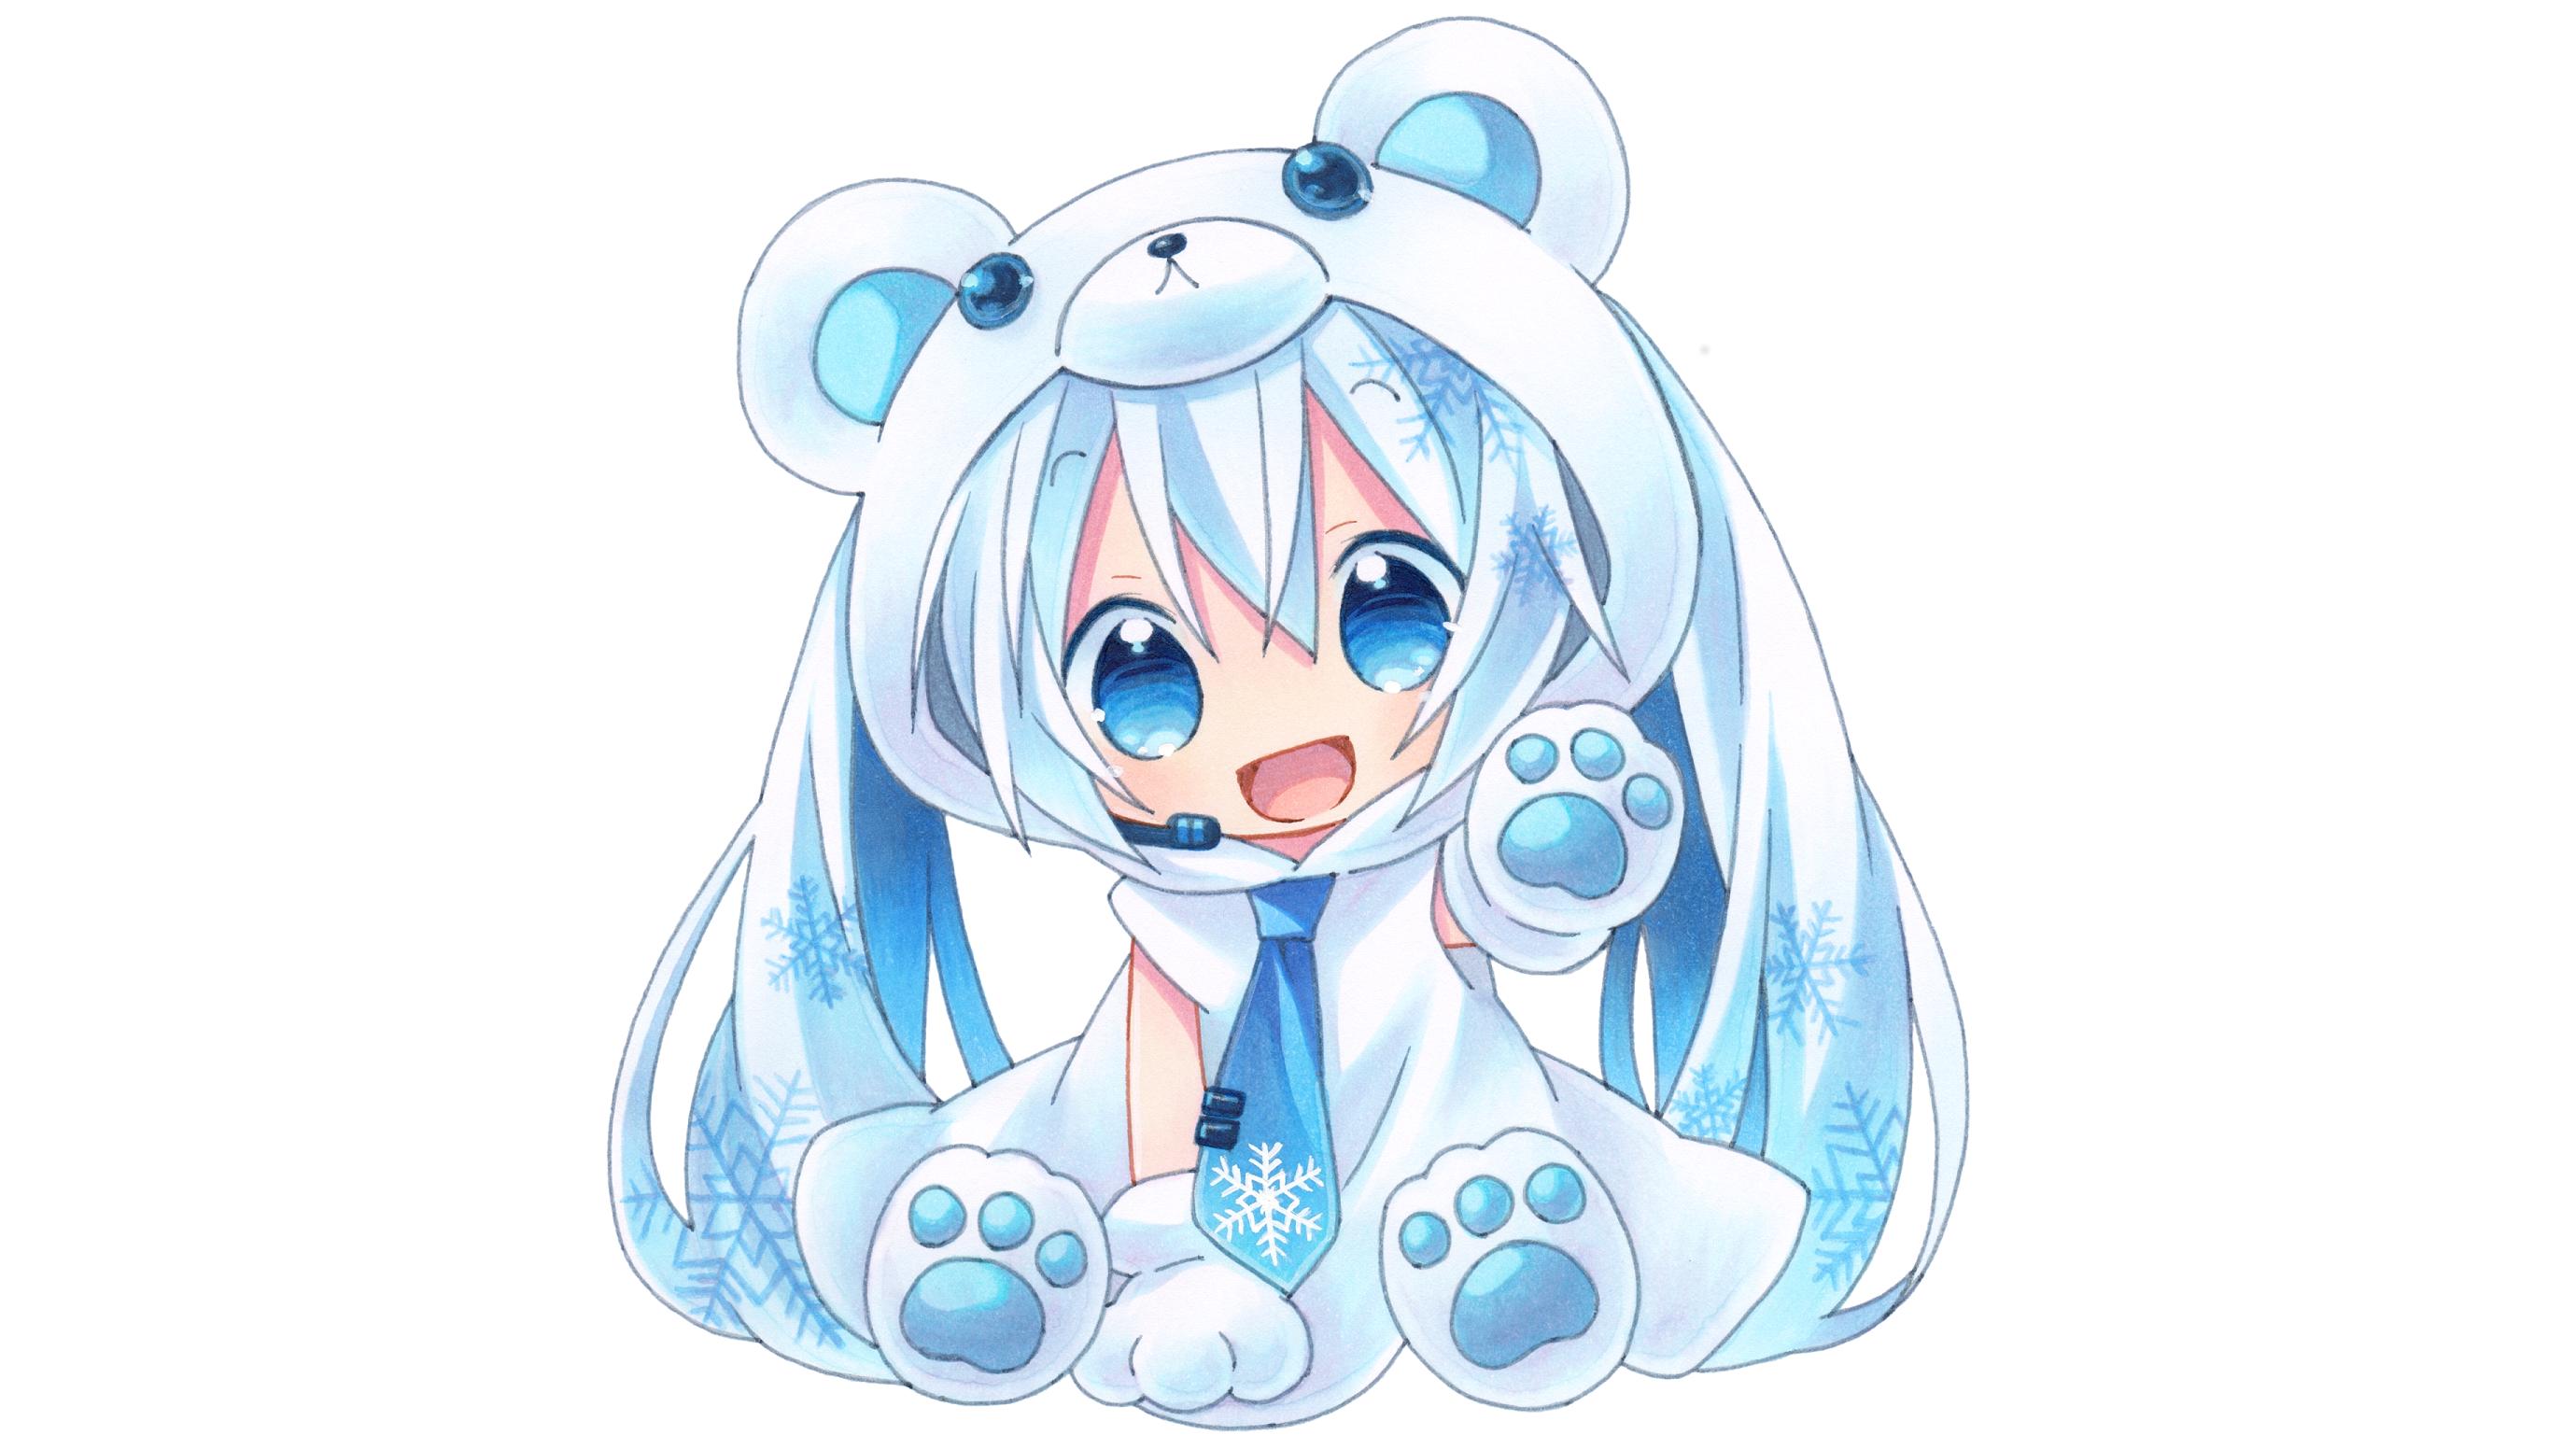 Fond d 39 cran illustration cheveux longs anime filles anime chibi dessin anim hatsune - Chibi background ...